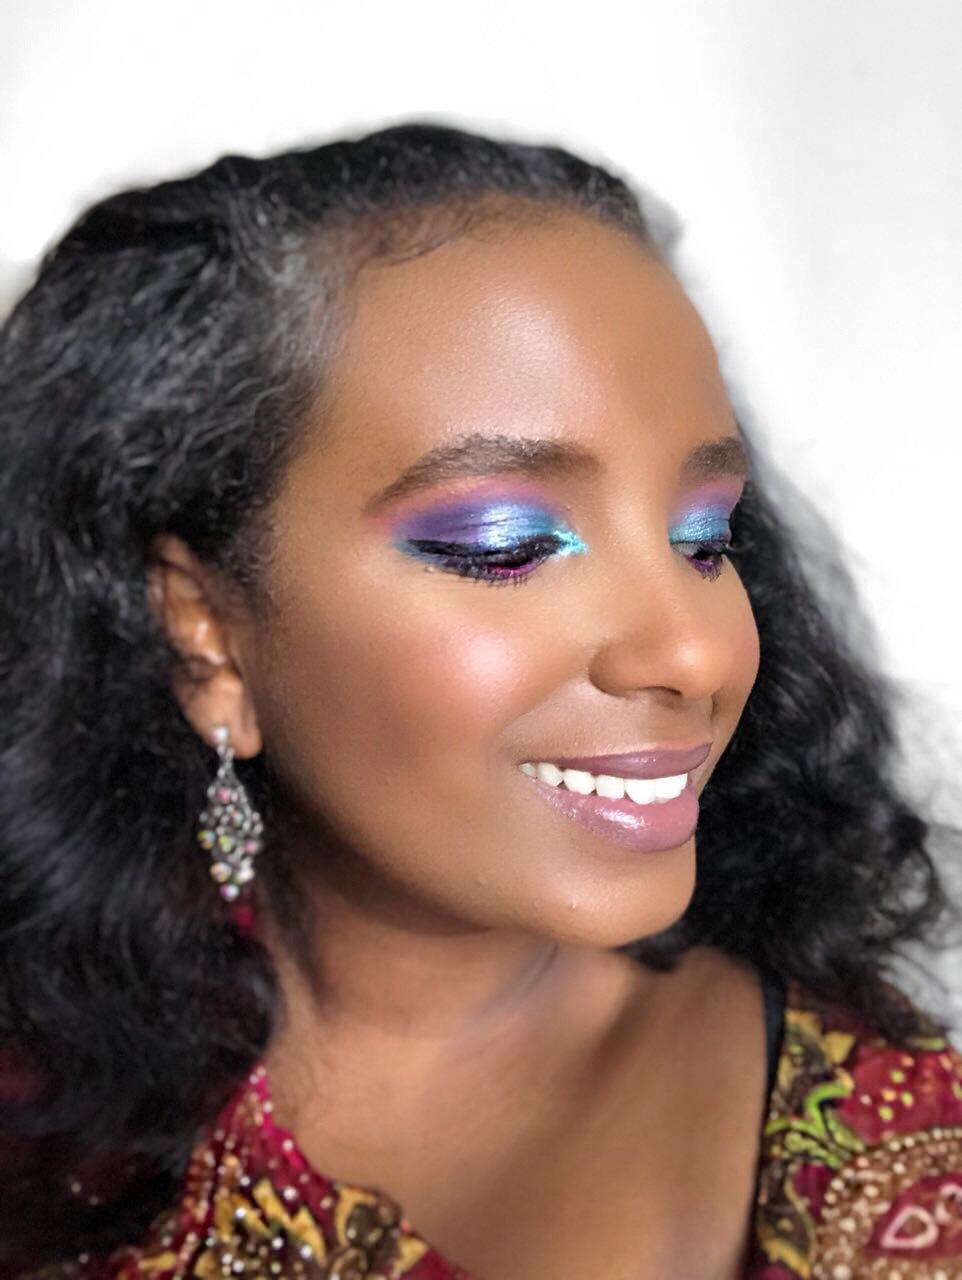 Oshinity huda beauty makeup blog review nairobi kenya